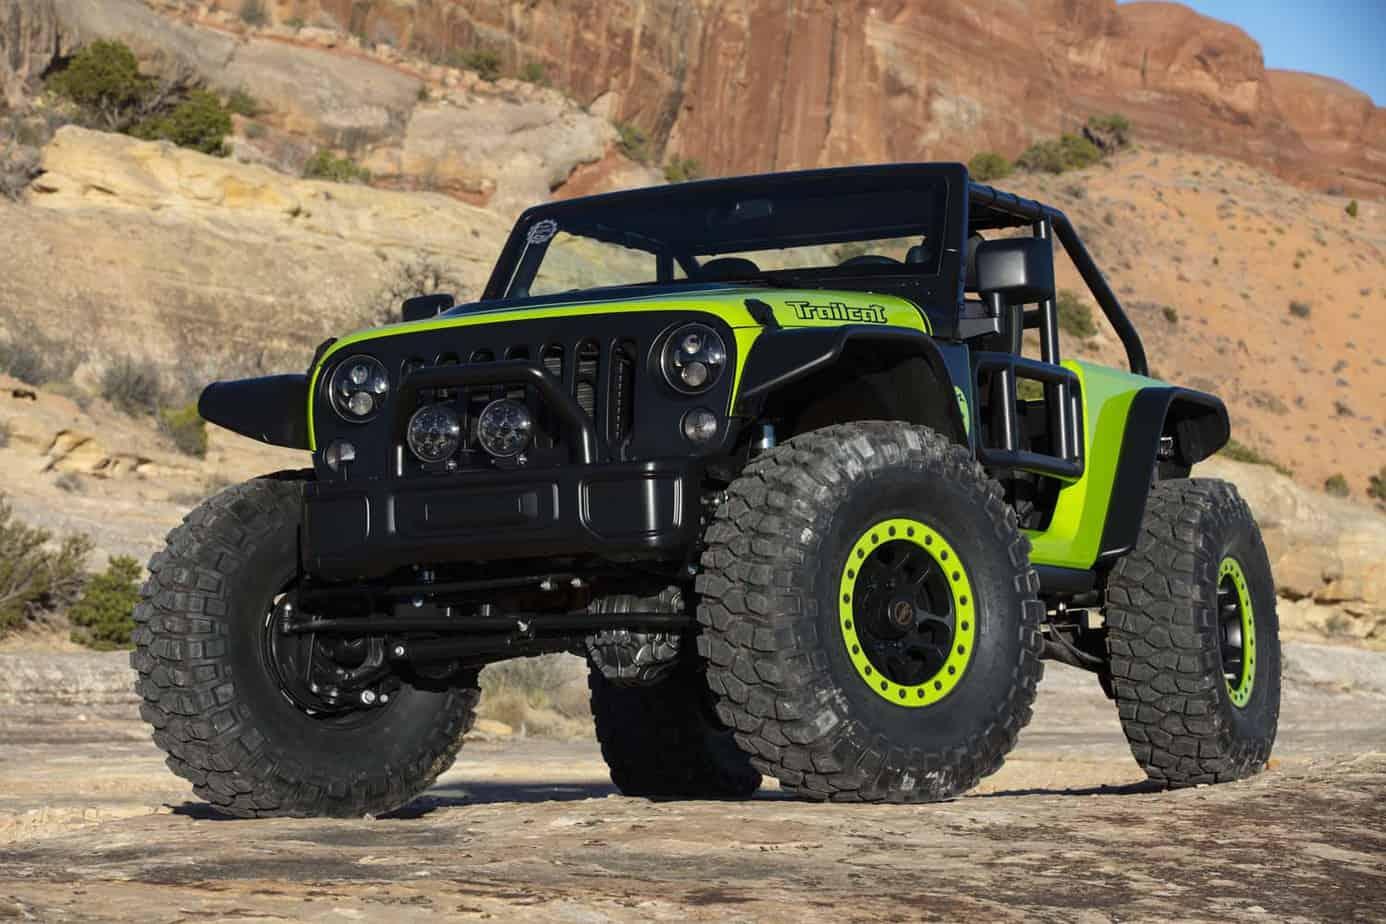 2016 Jeep Comanche >> Jeeps new concept vehicles hit the trail – Expedition Portal